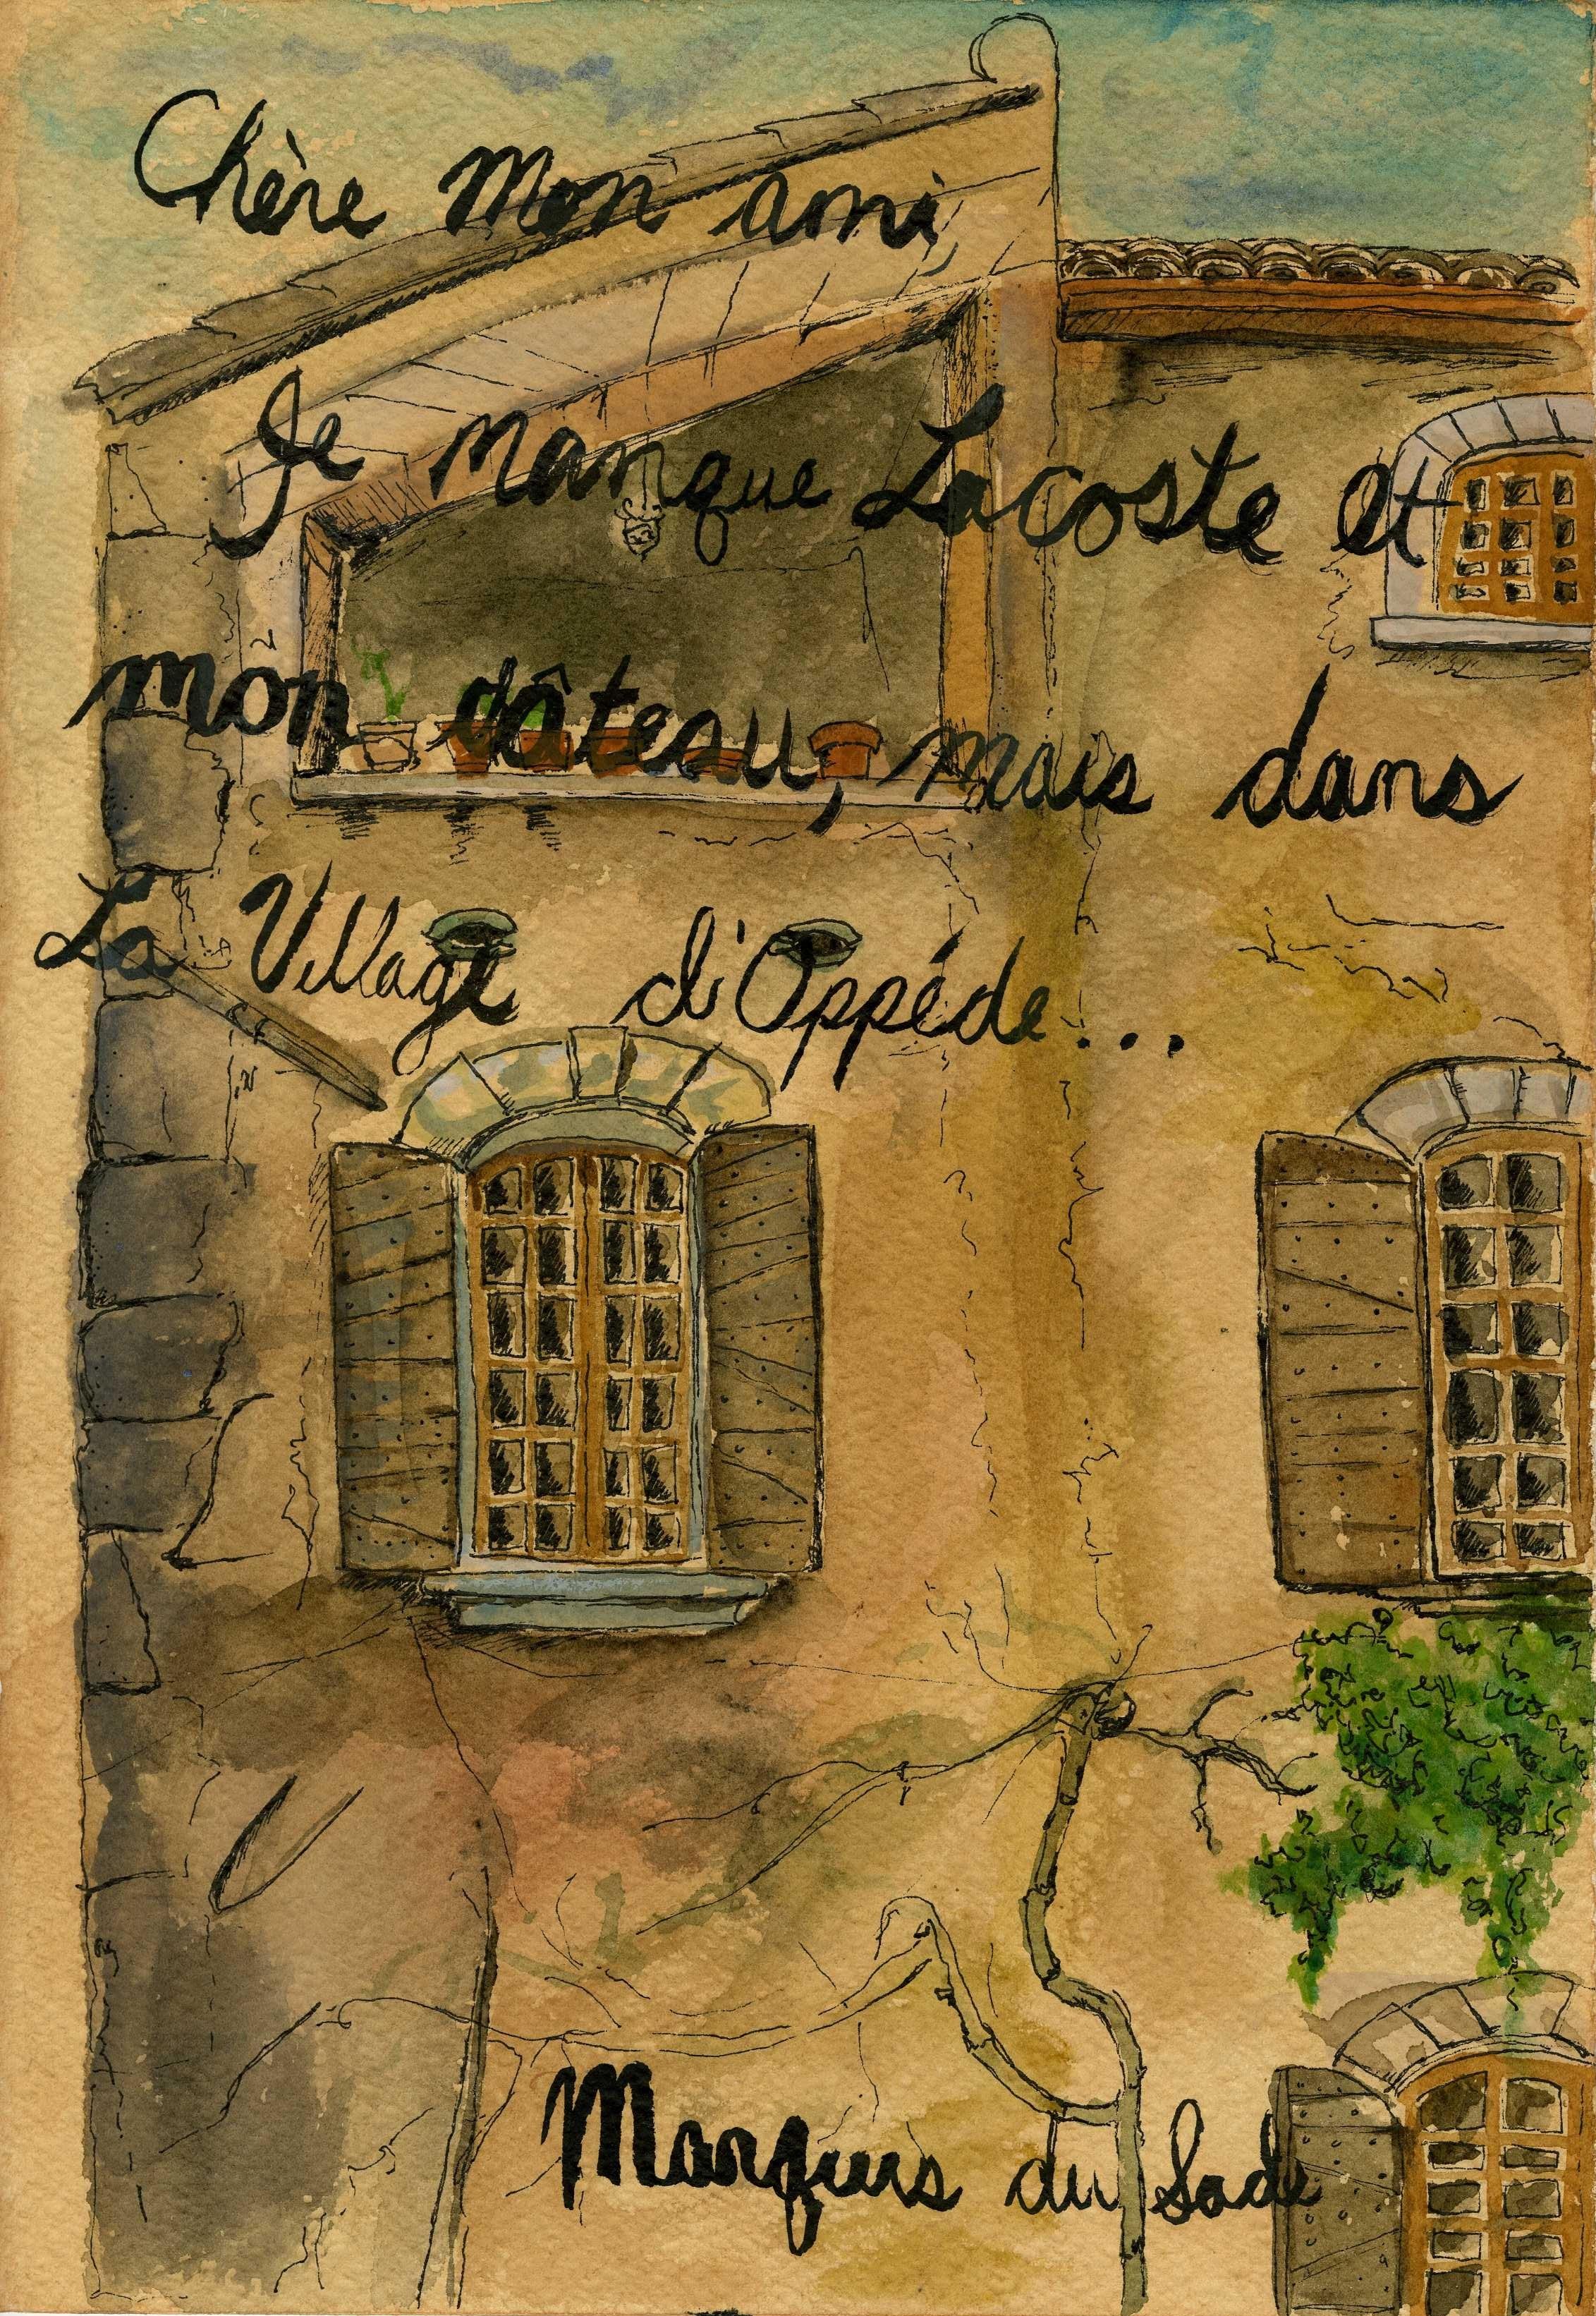 Marquis du Sade Letter